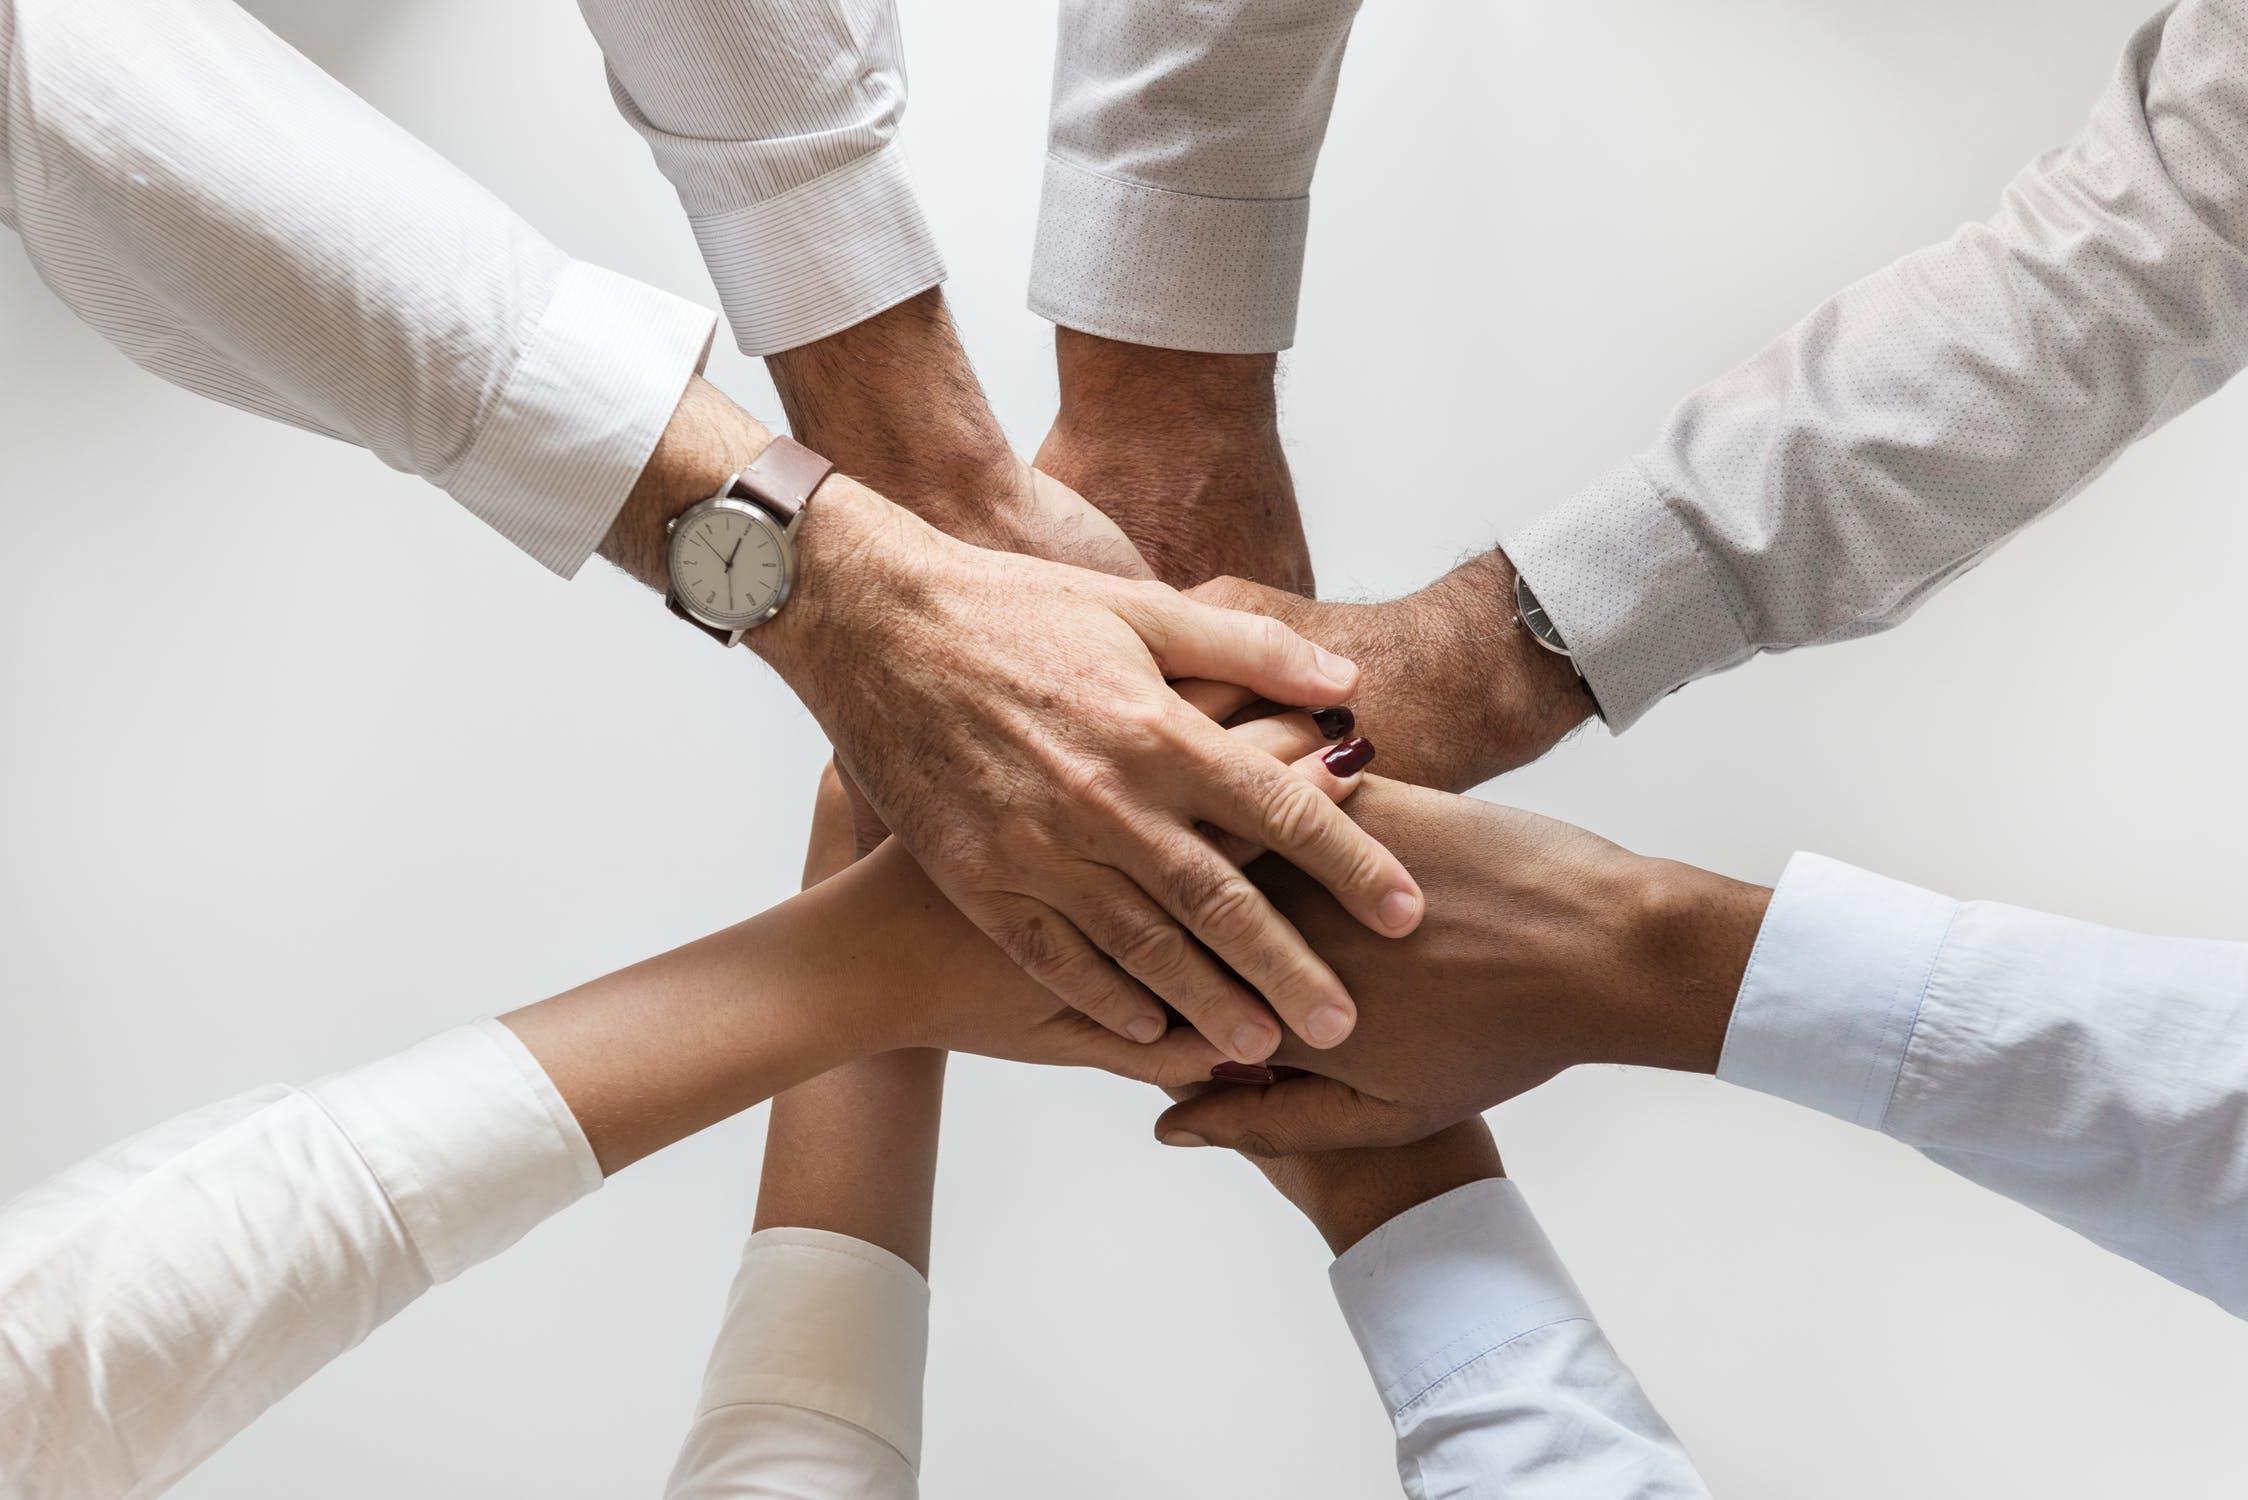 career, risk management, anti-fraud, investigations, cri group